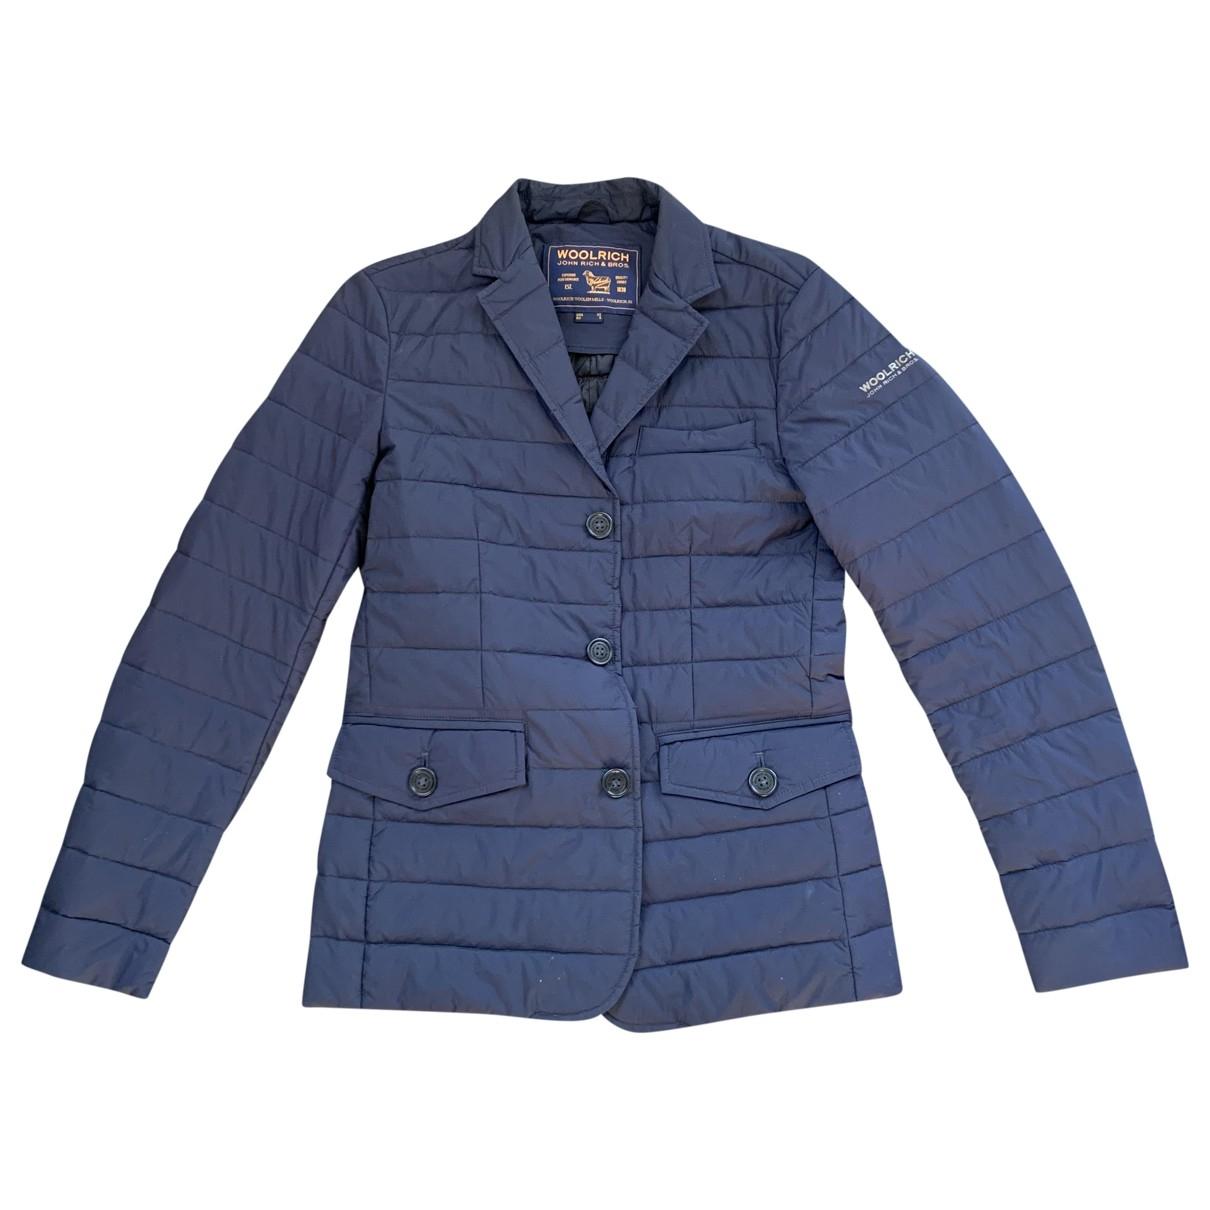 Woolrich \N Navy jacket  for Men S International